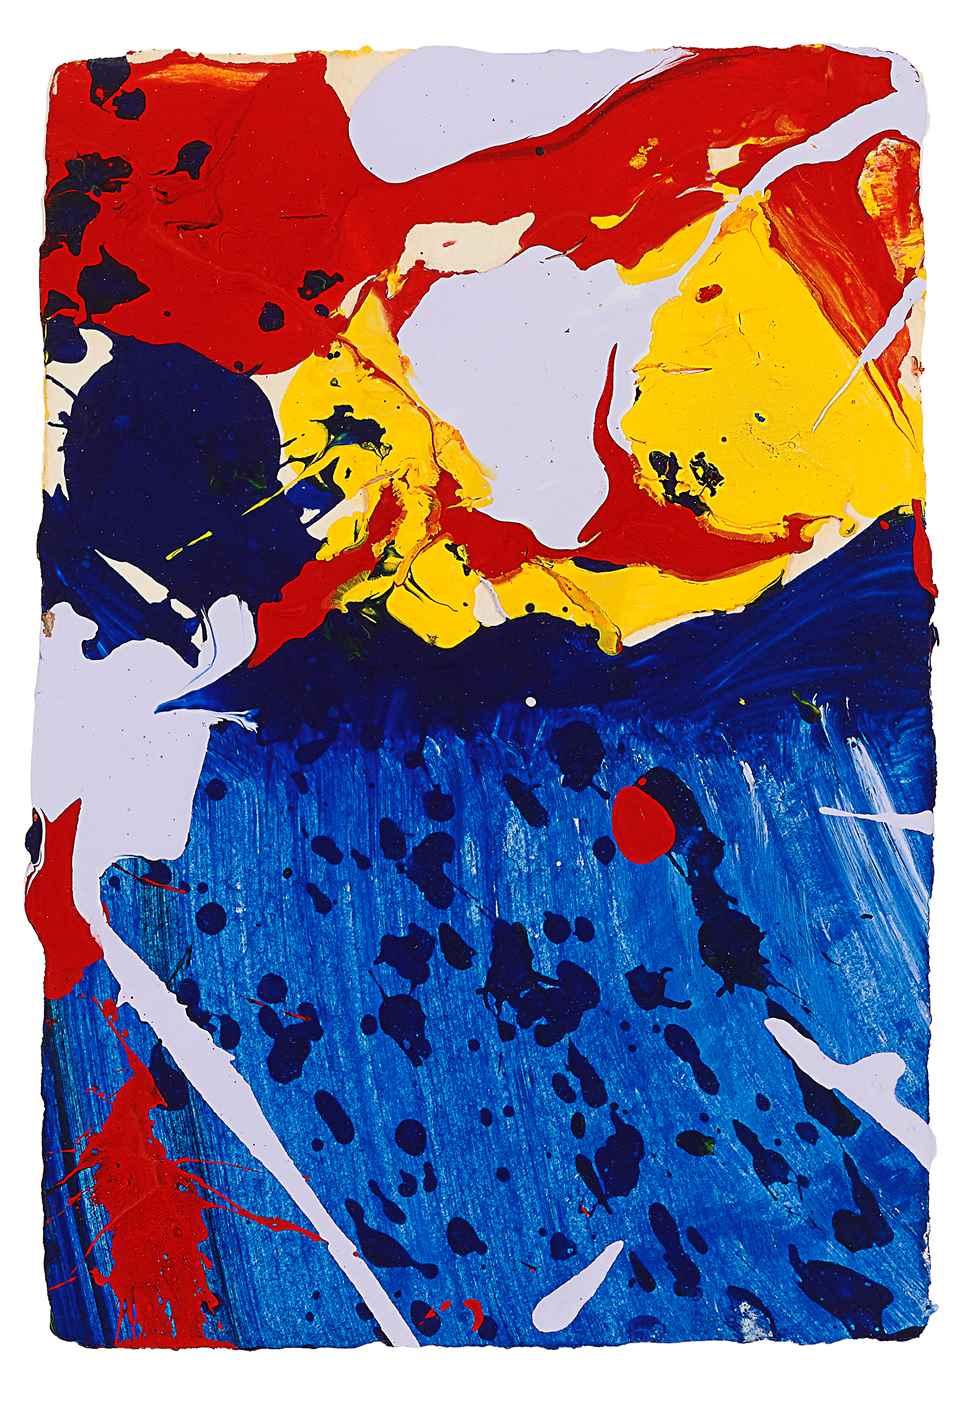 Sklye - Sam Francis (1923 - 1994)